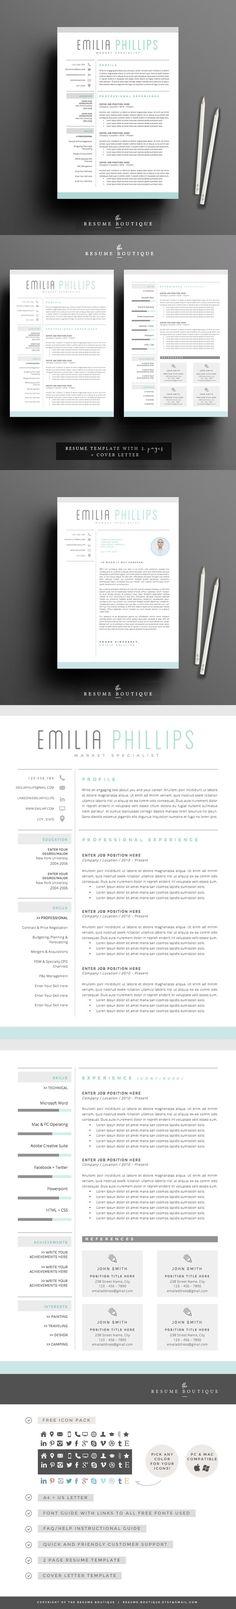 #resume #design from themexriver | DOWNLOAD: https://creativemarket.com/themexriver/657855-Resume?u=zsoltczigler